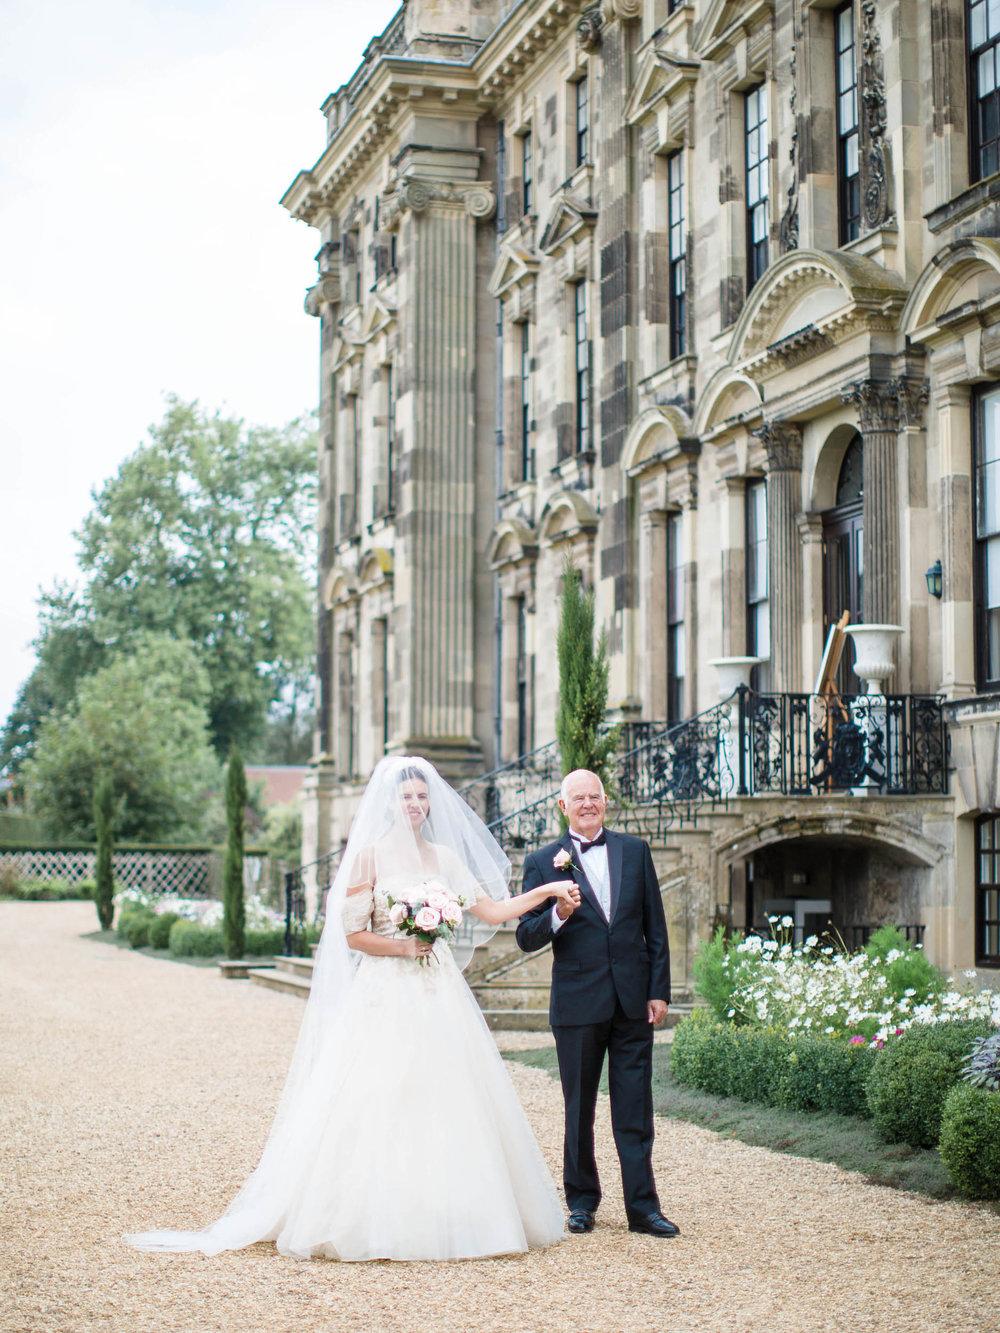 Amy O'Boyle Photography- Destination & UK Fine Art Film Wedding Photographer- Stoneleigh Abbey Wedding-37.jpg